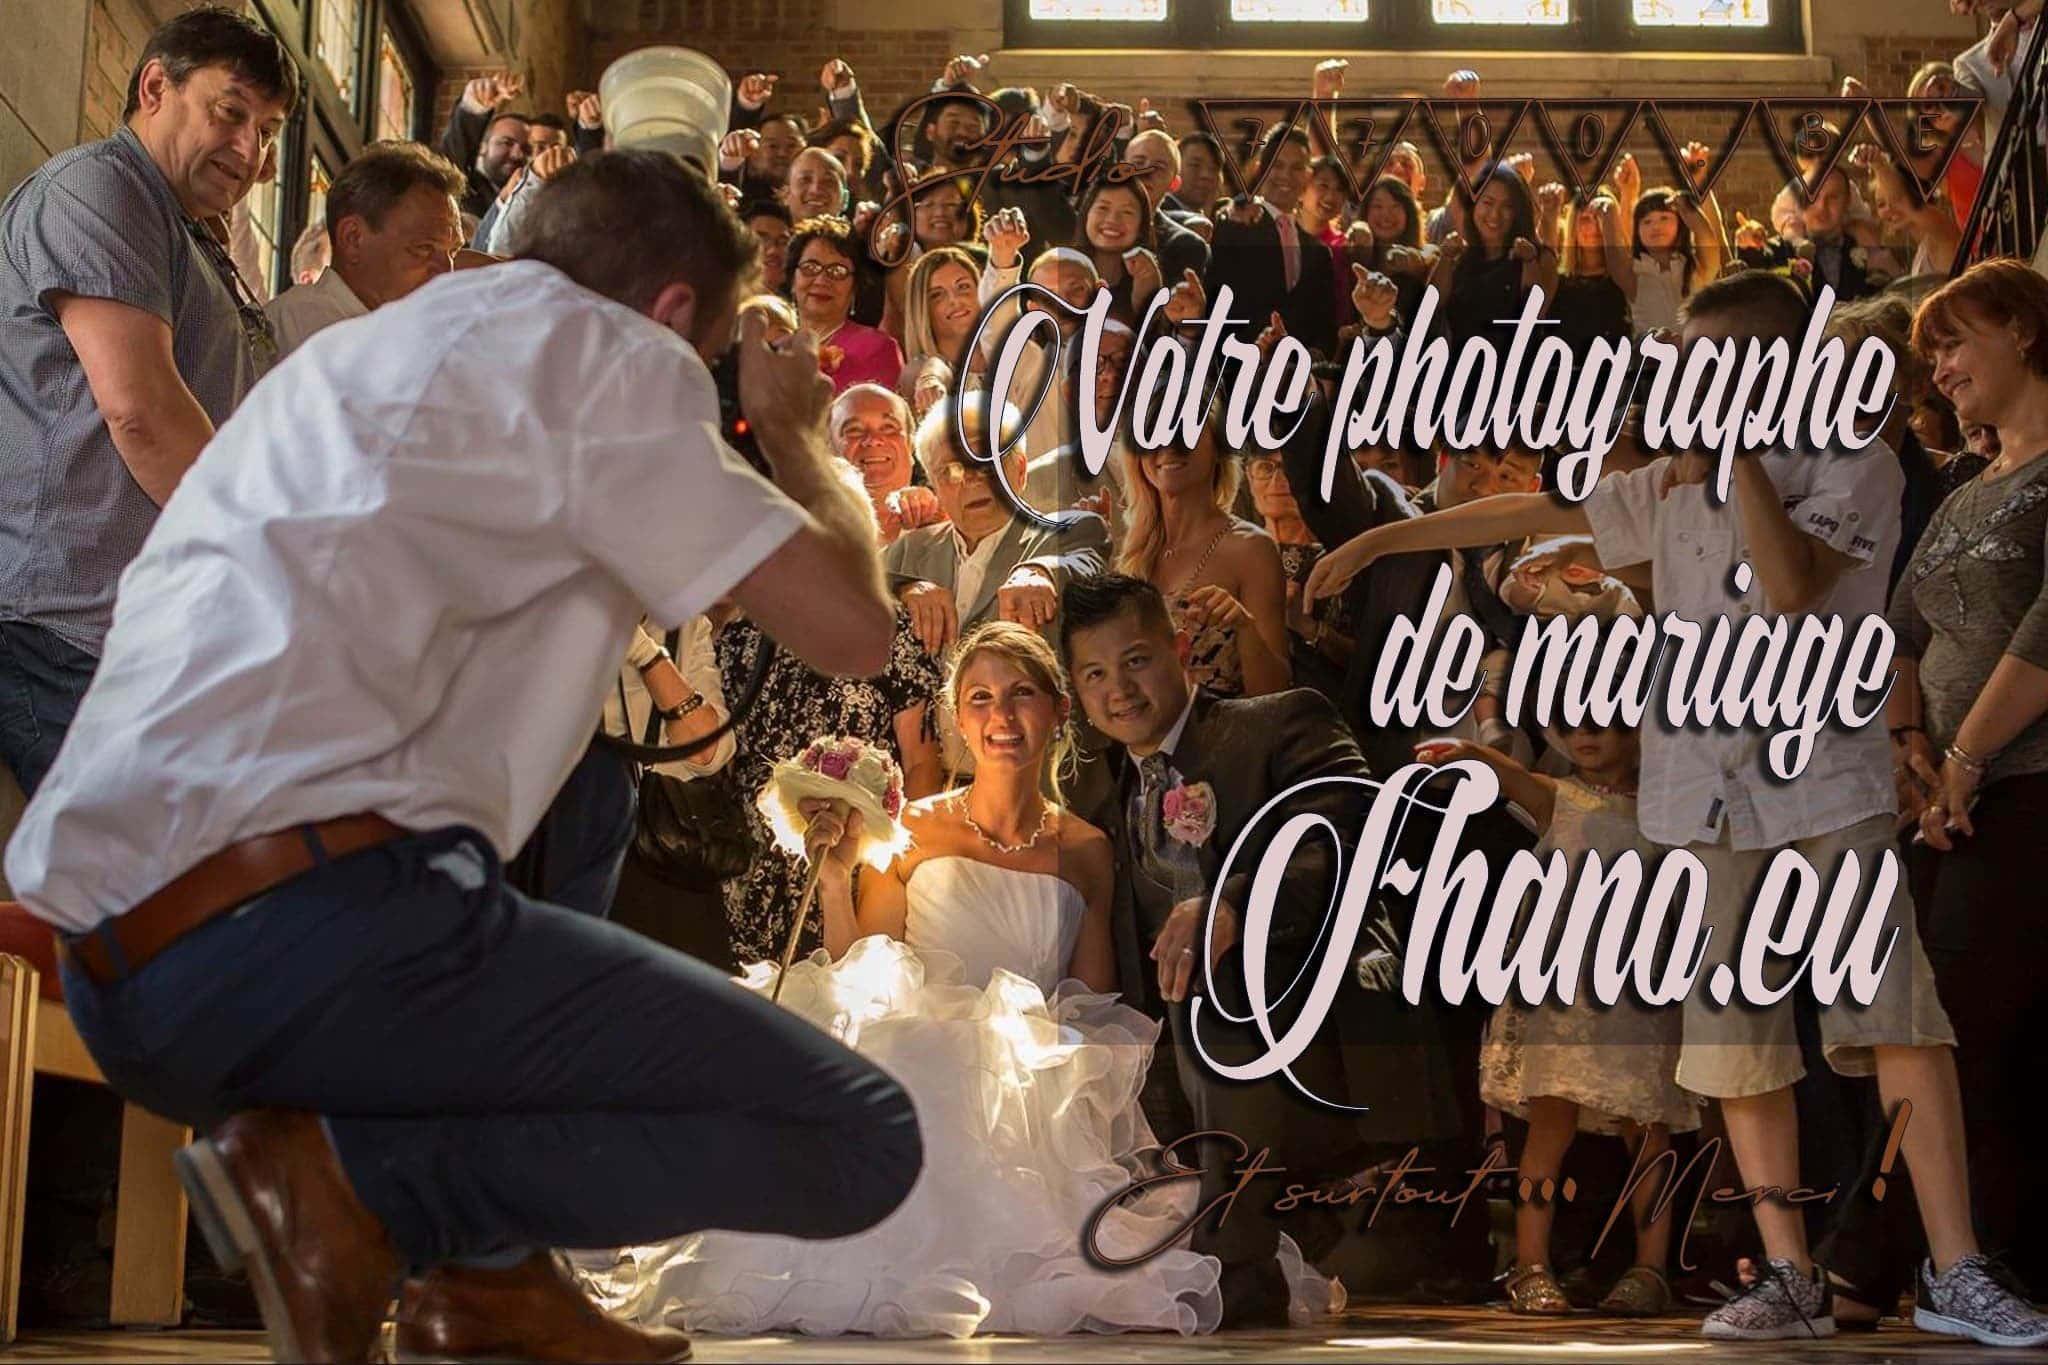 Fhano.eu votre photographe de mariage au studio 7700.BE